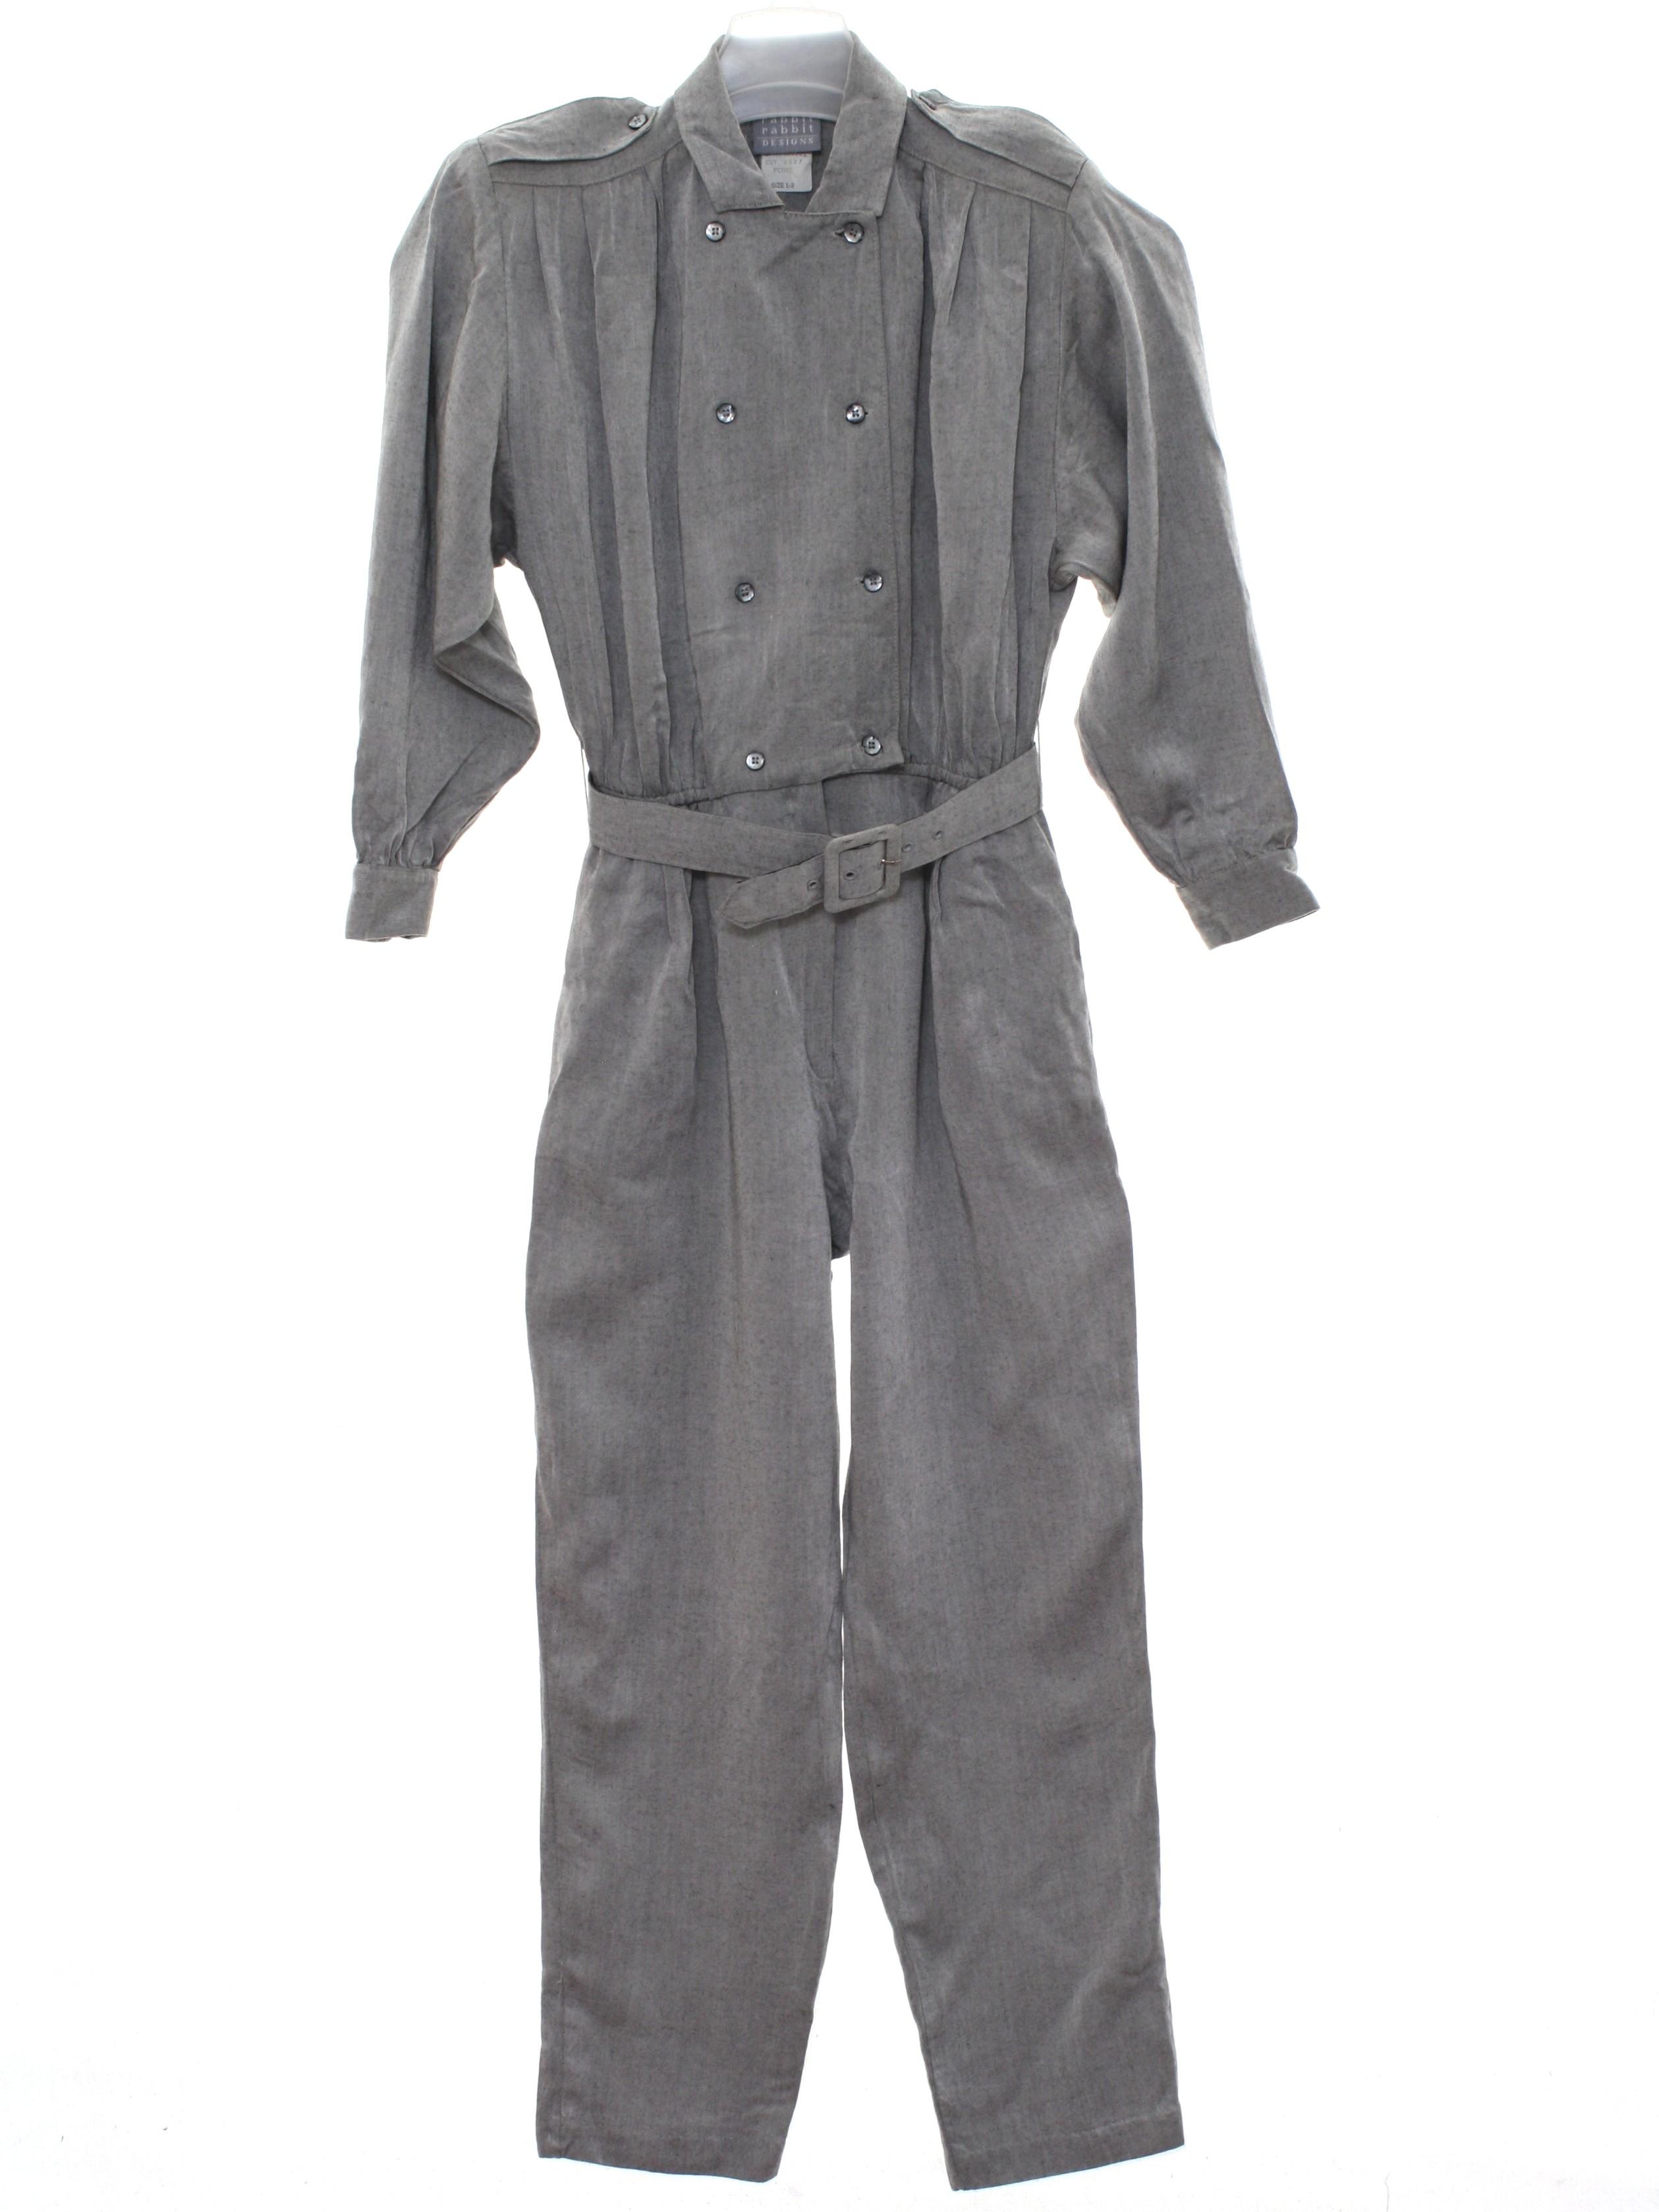 62a7aef893f Retro 1980 s Suit (rabbit)   80s -rabbit- Womens grey